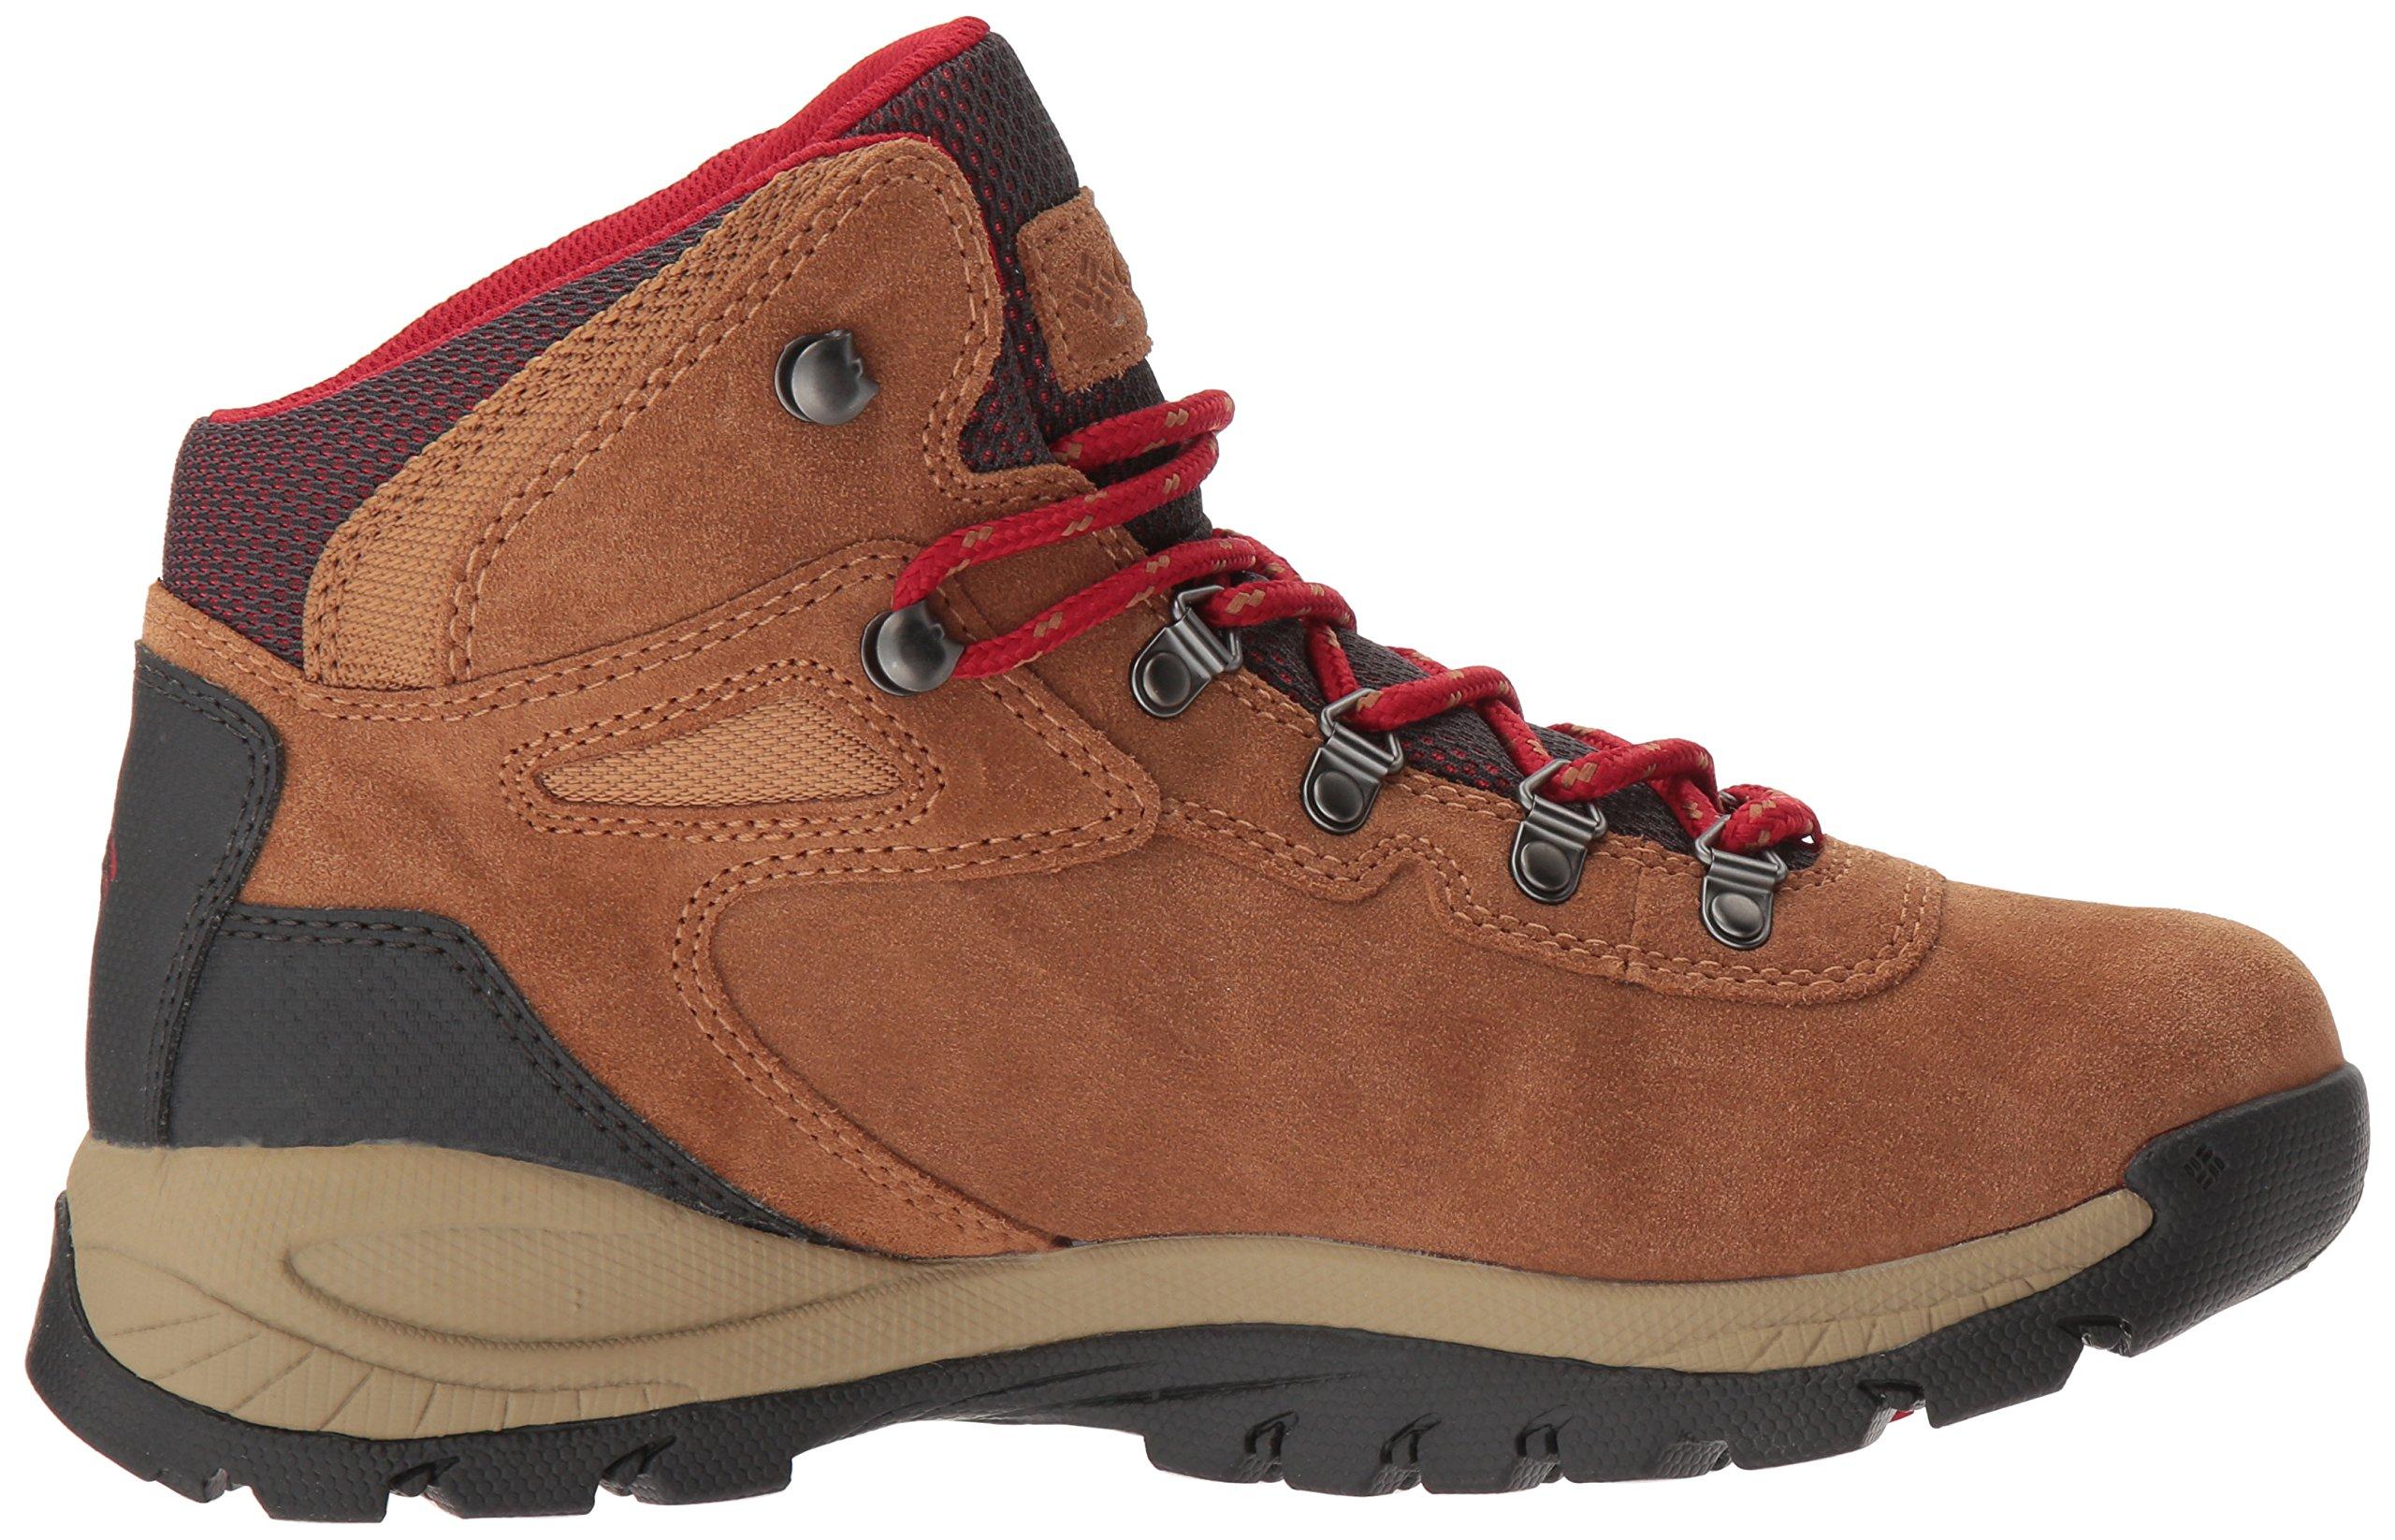 Columbia Women's Newton Ridge Plus Waterproof Amped Hiking Boot, Elk, Mountain Red, 7.5 B US by Columbia (Image #7)